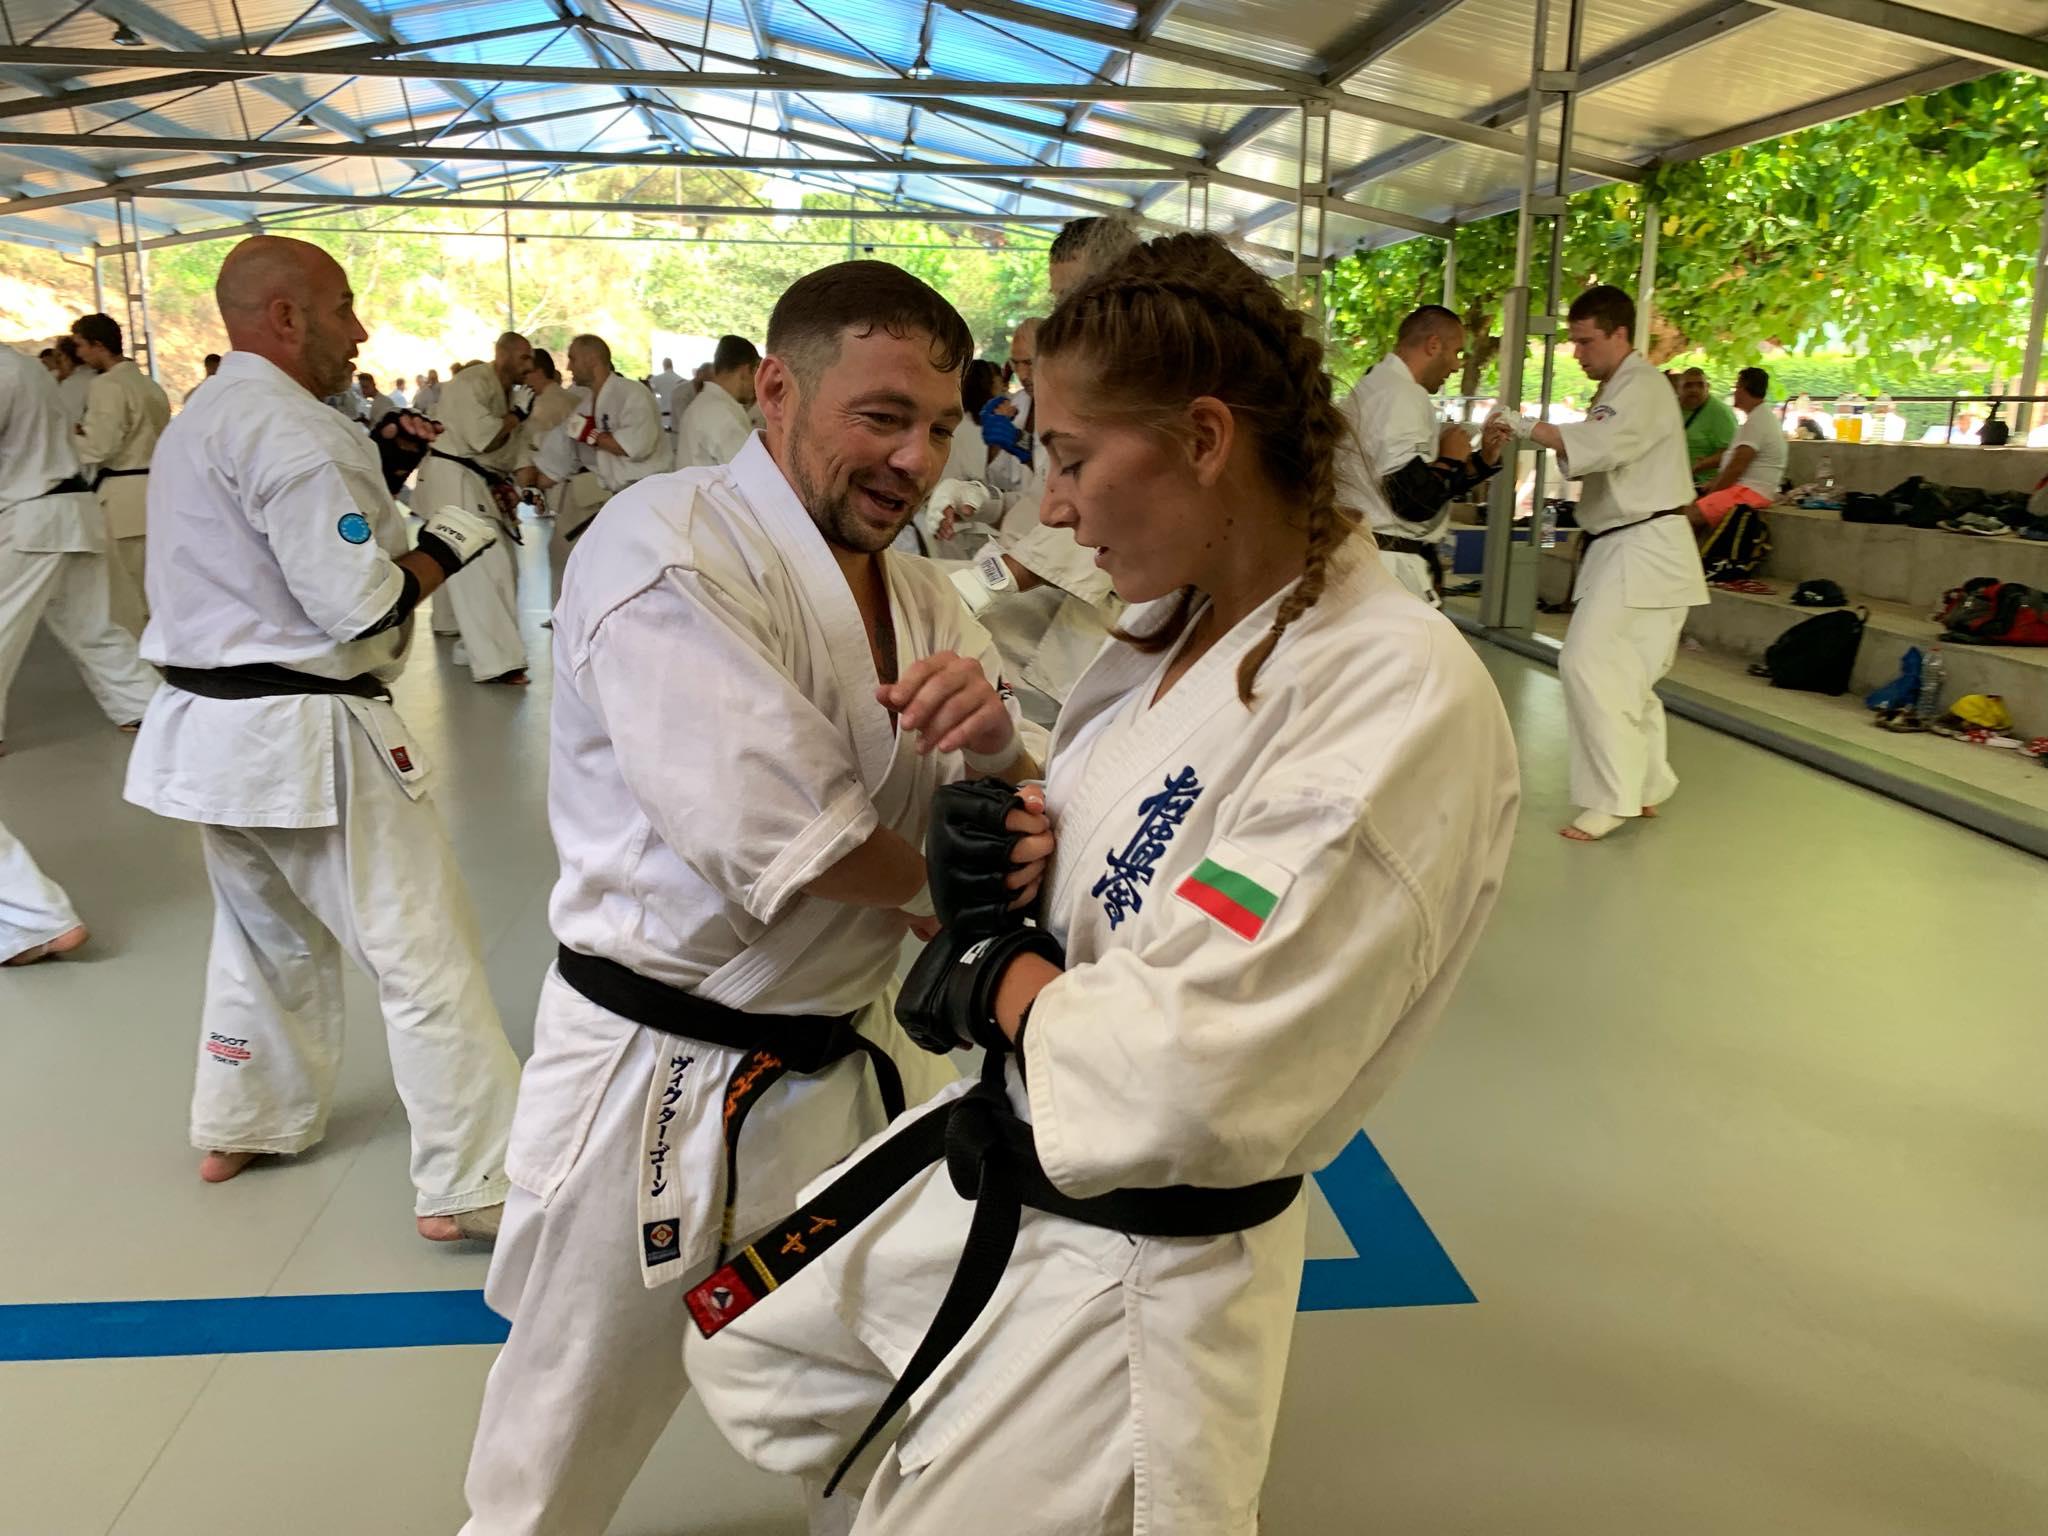 300 бойци изненадаха наша шампионка за рождения ѝ ден (ВИДЕО)